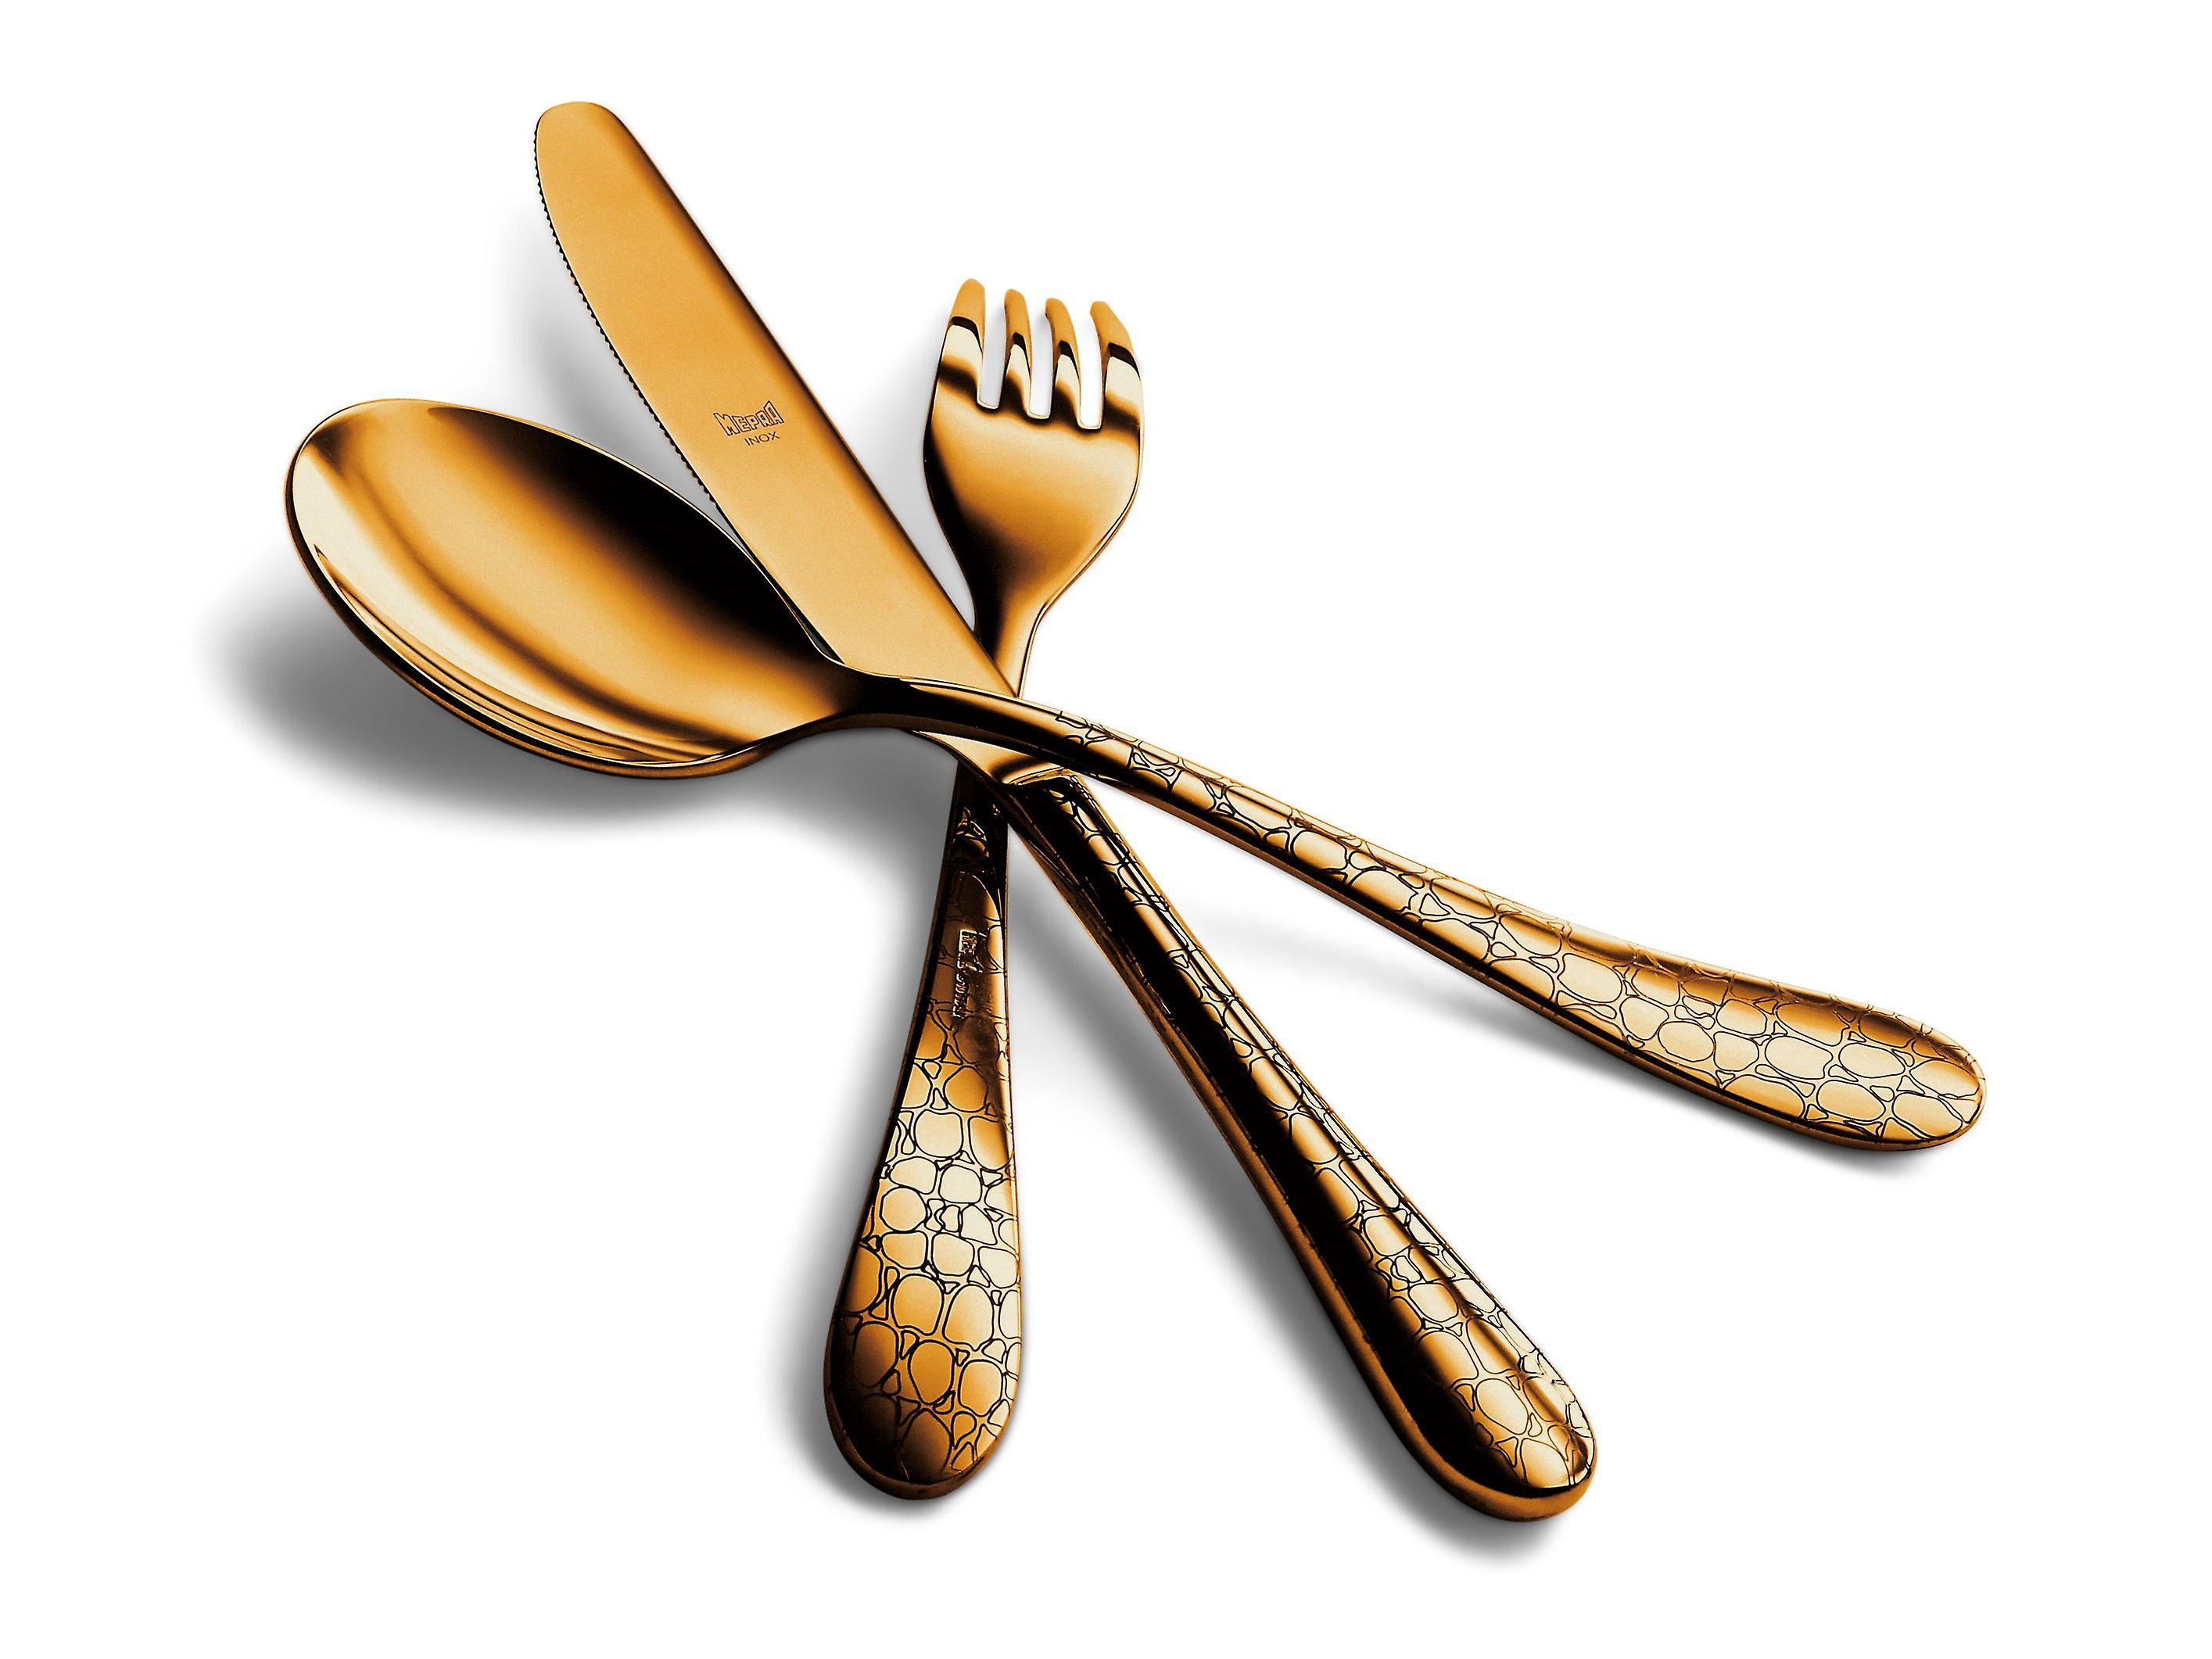 Mepra Coccodrillo Oro 4 pcs flatware set